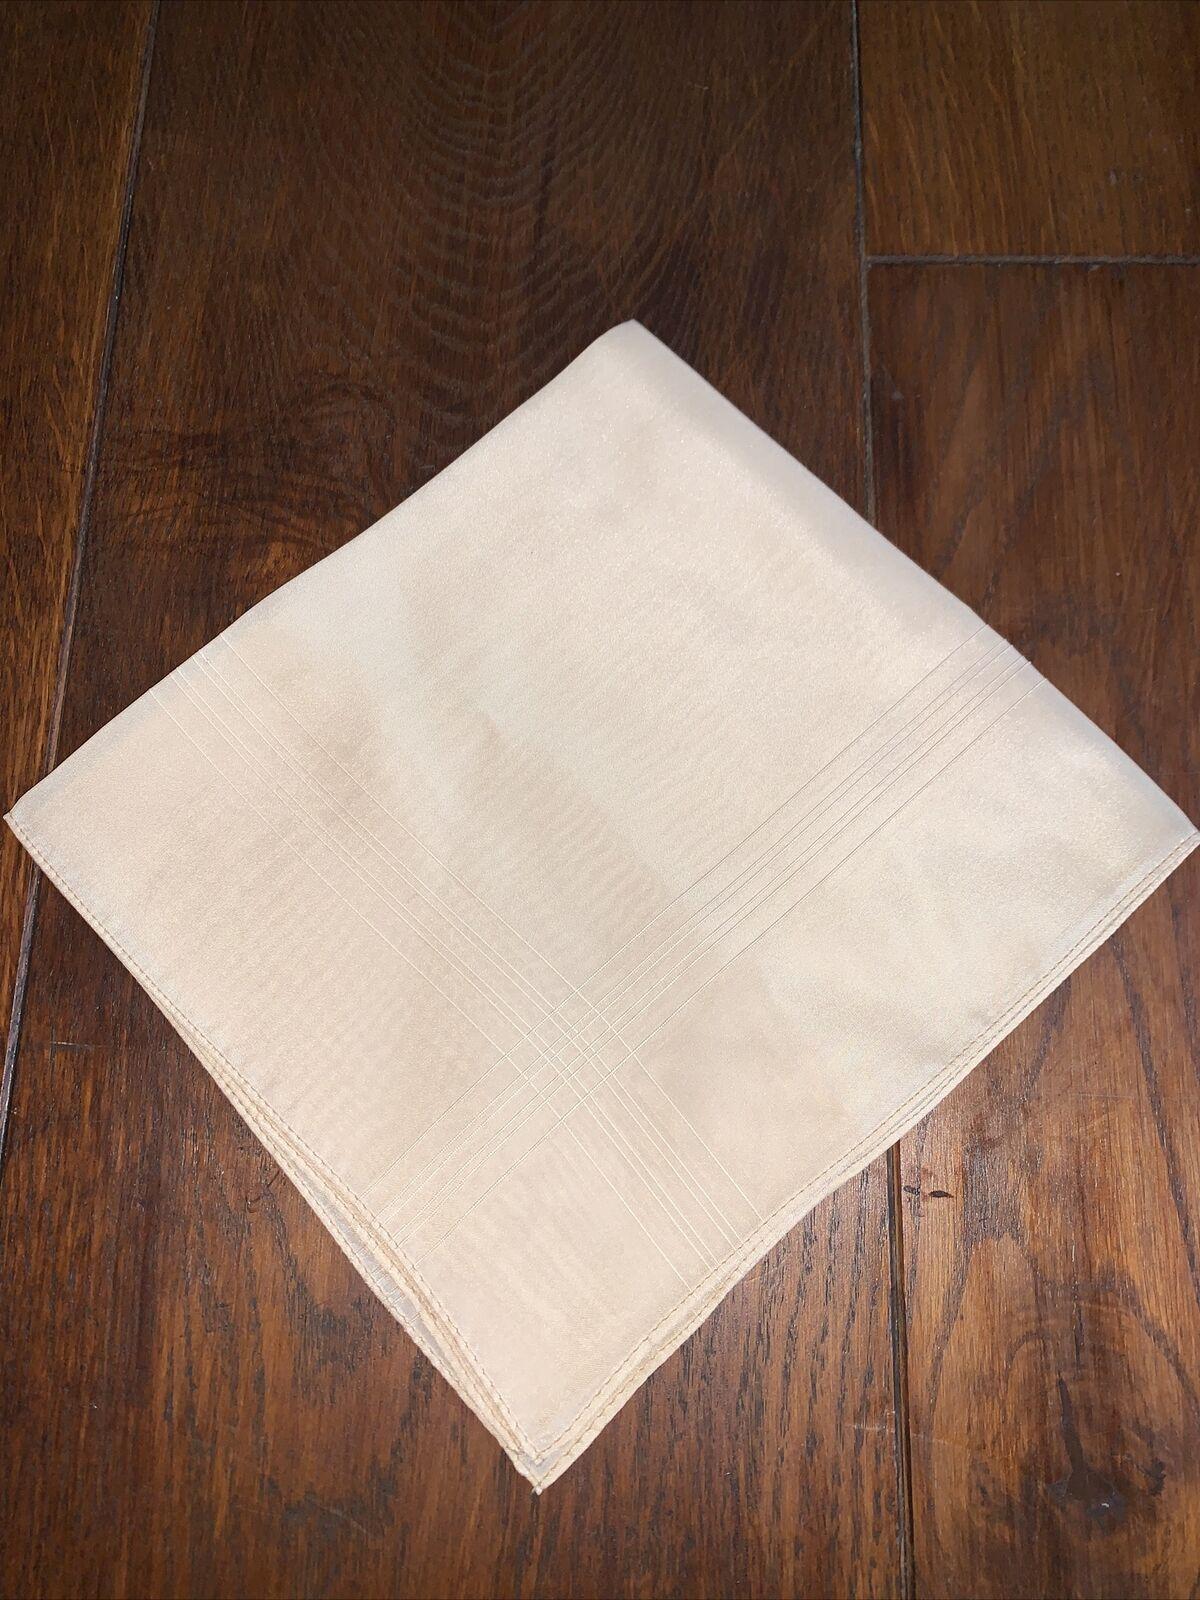 Ivory Square Pocket Scarf BRAND NEW 100% English Silk 39cmx41cm Subtle Line